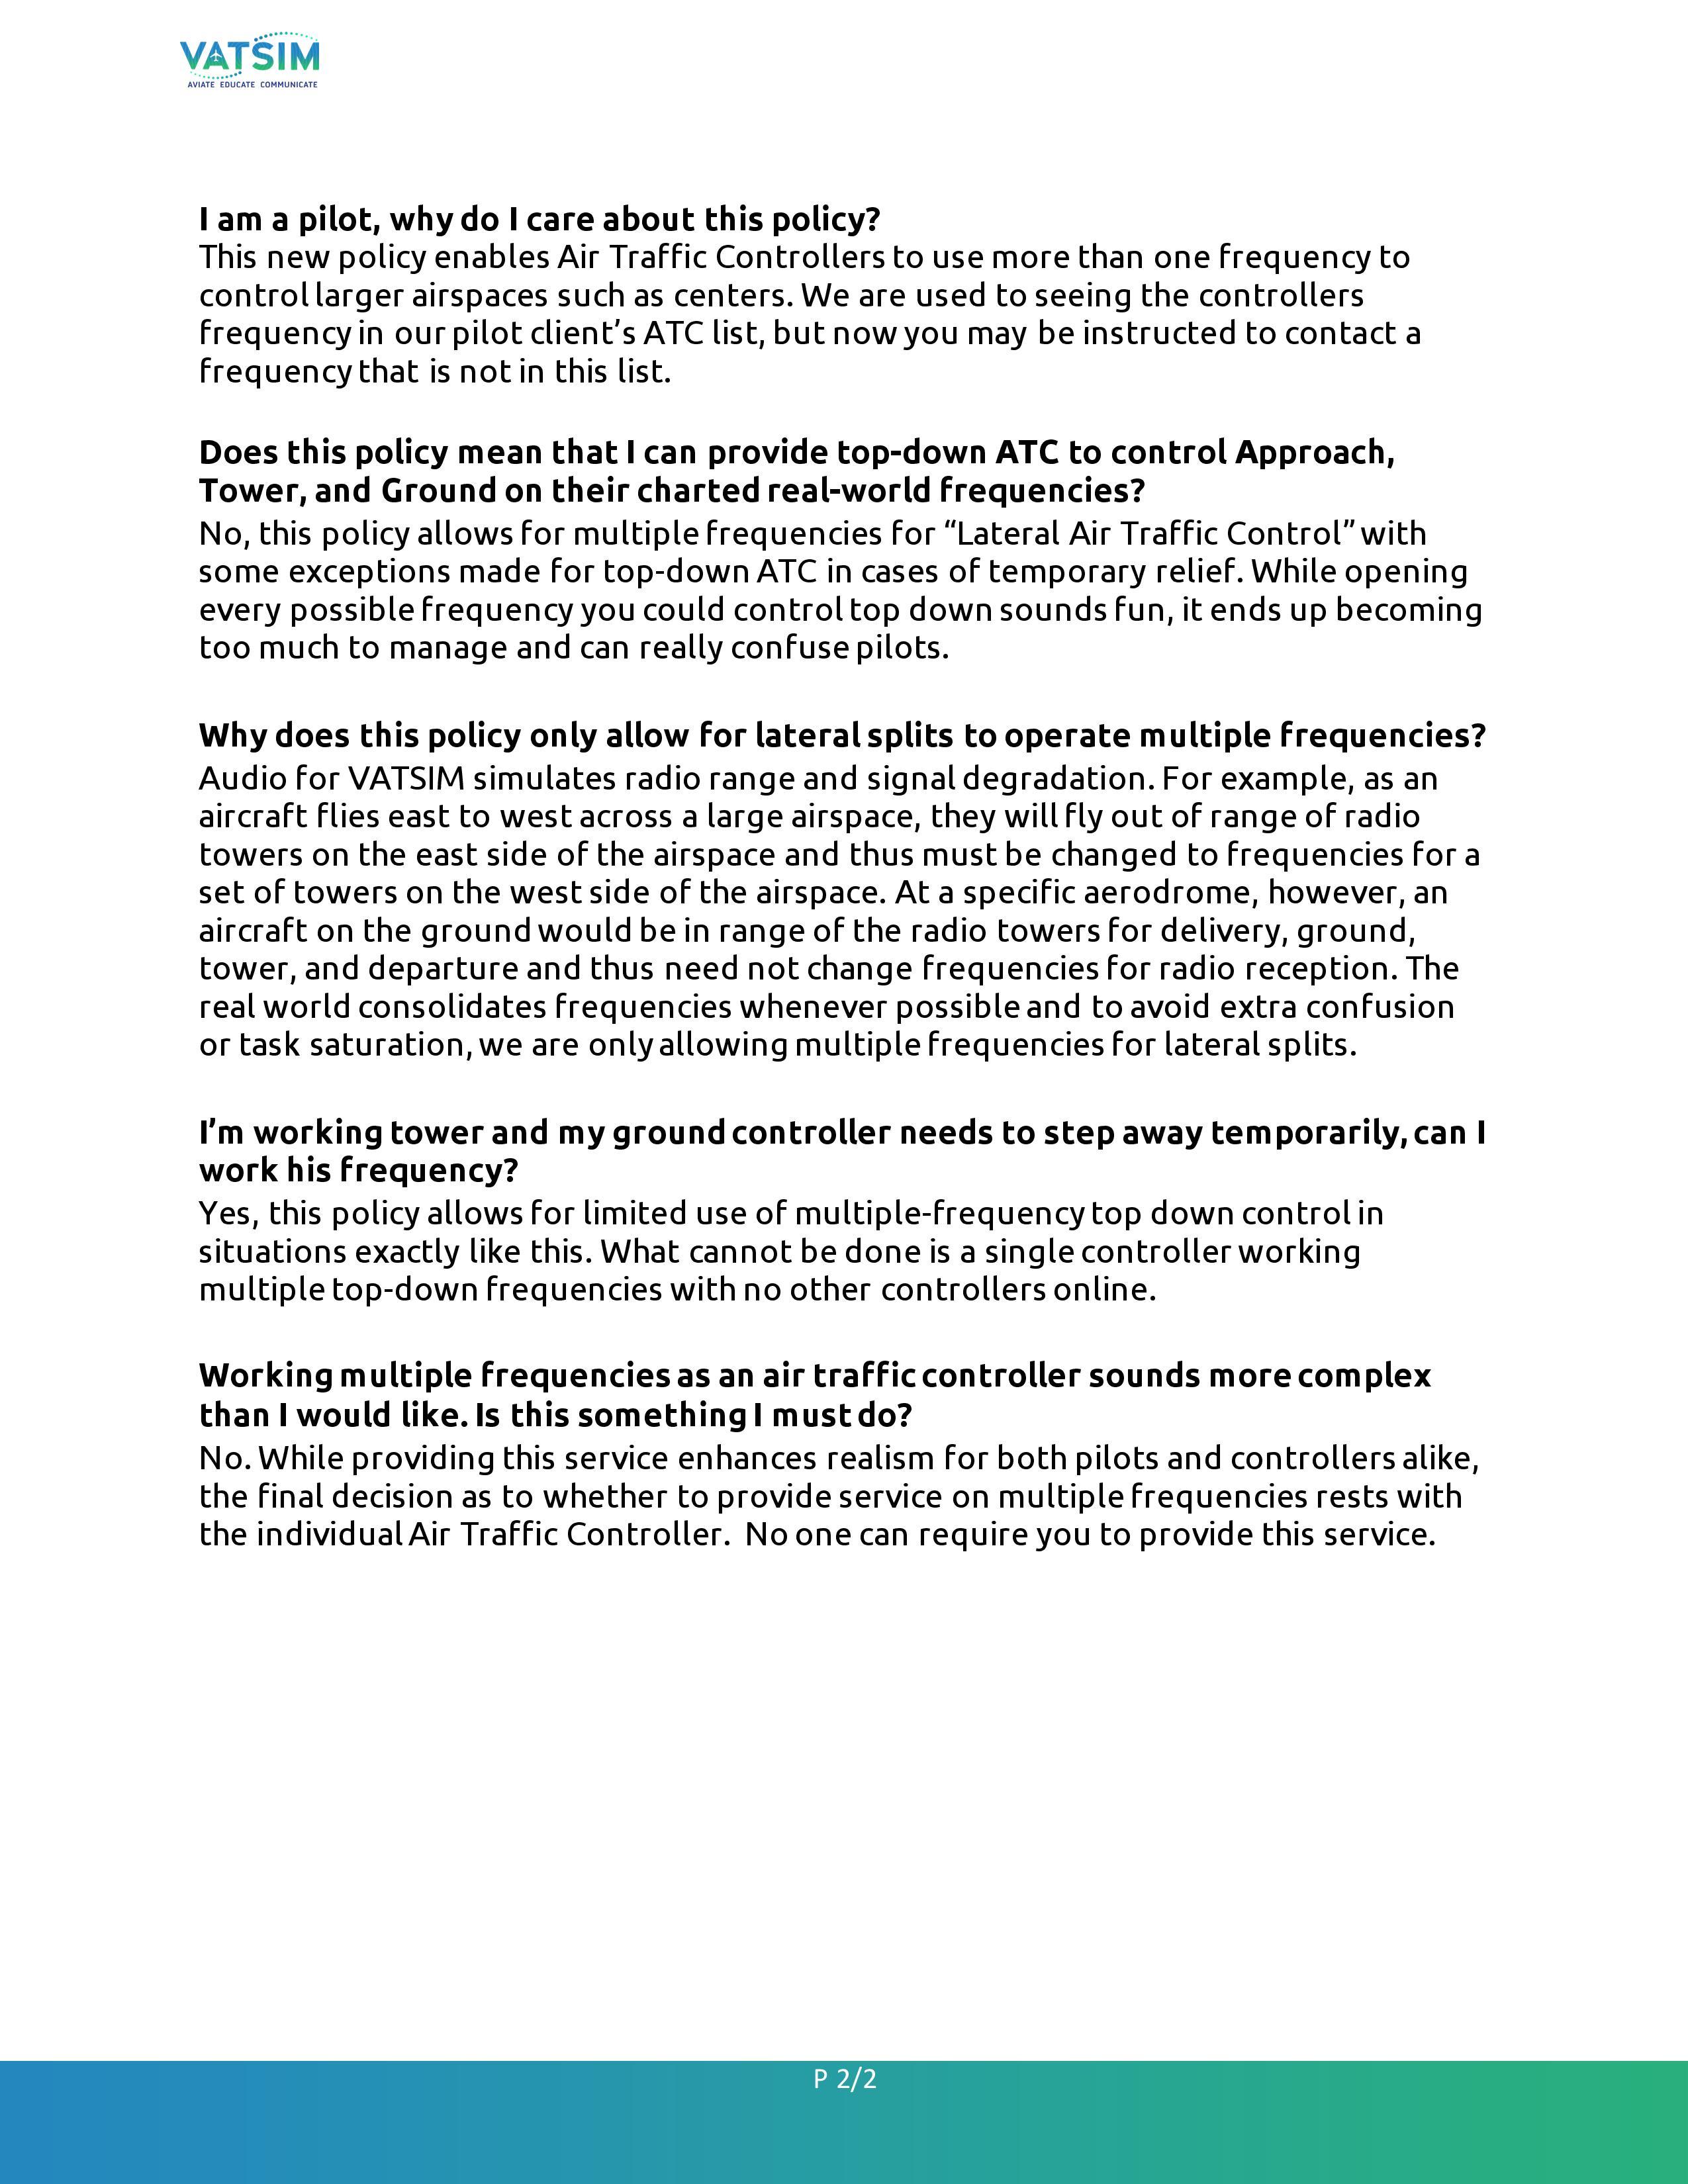 ATCFMP_Announcement-page-002.jpg